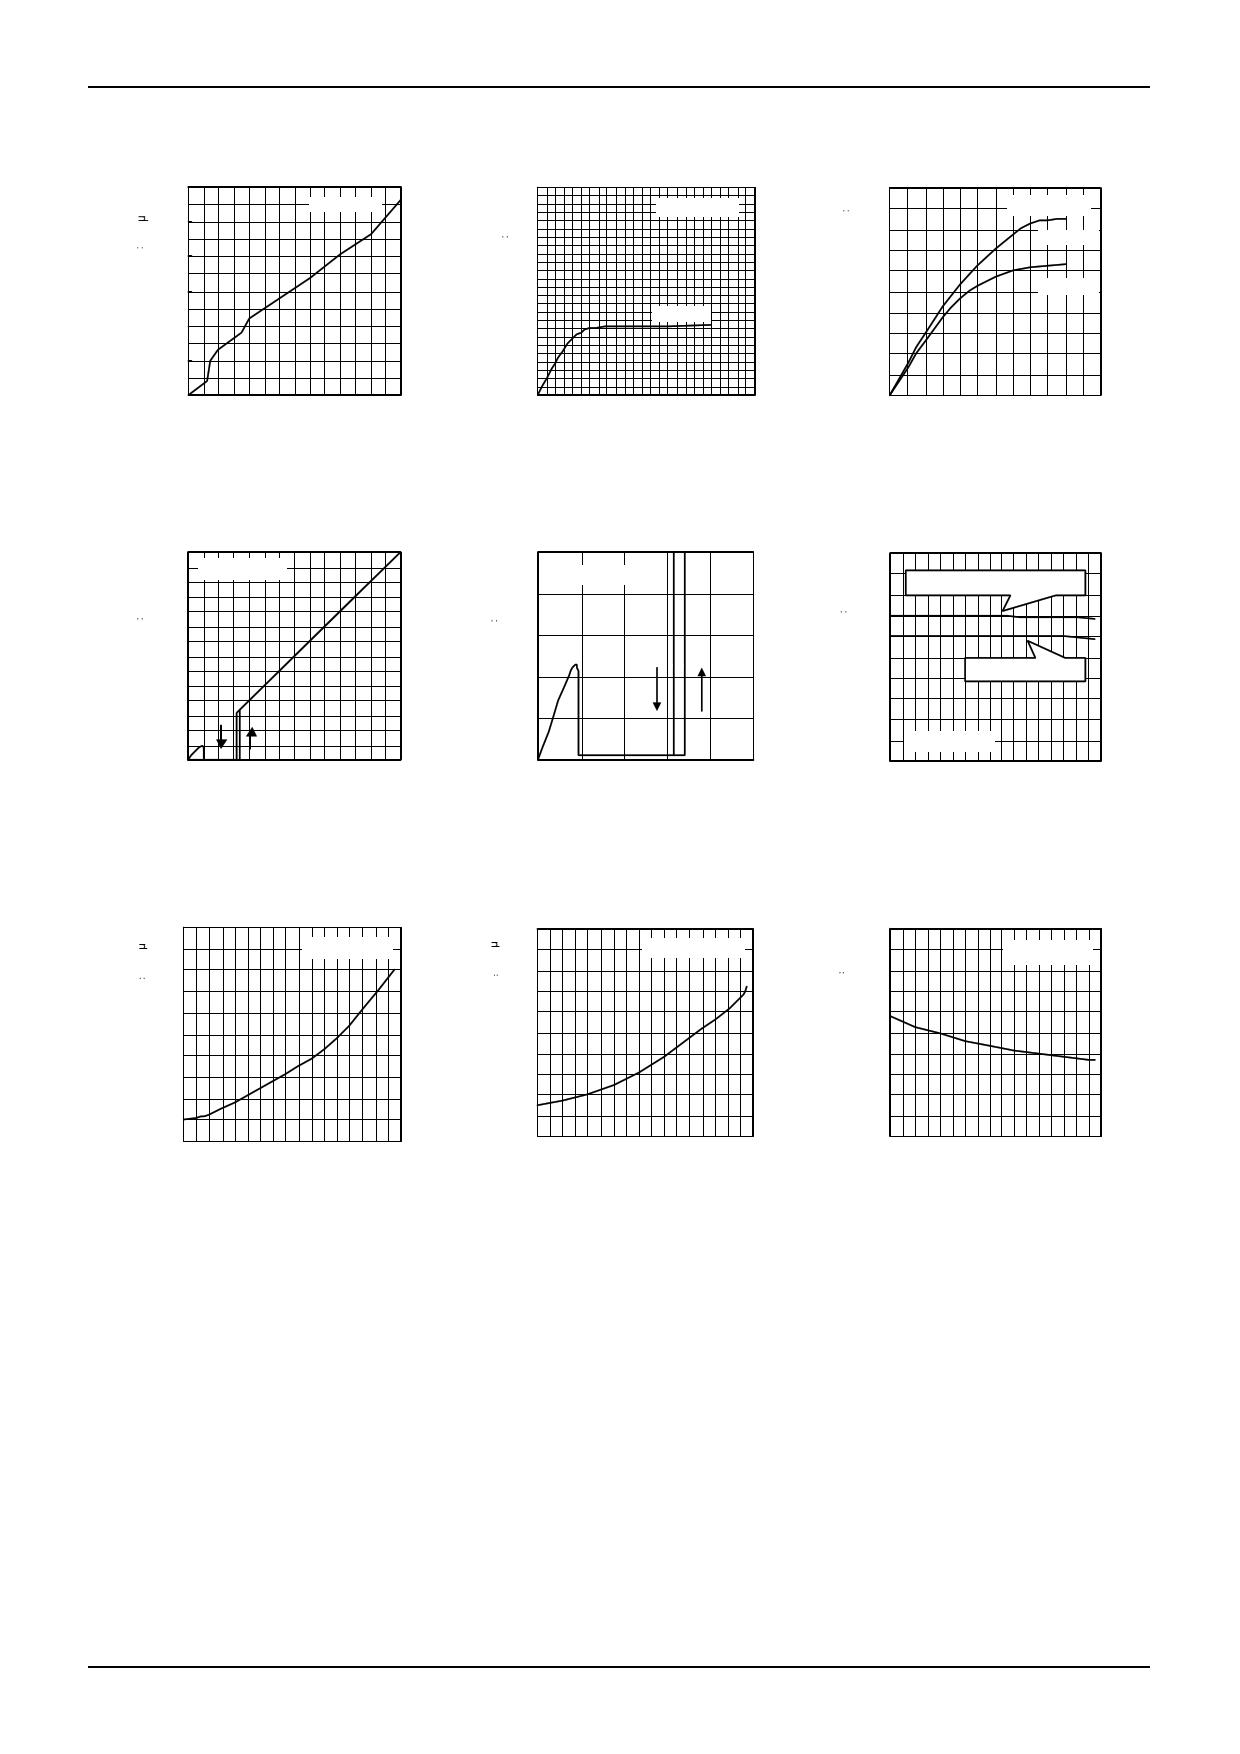 BU4943 pdf, 반도체, 판매, 대치품